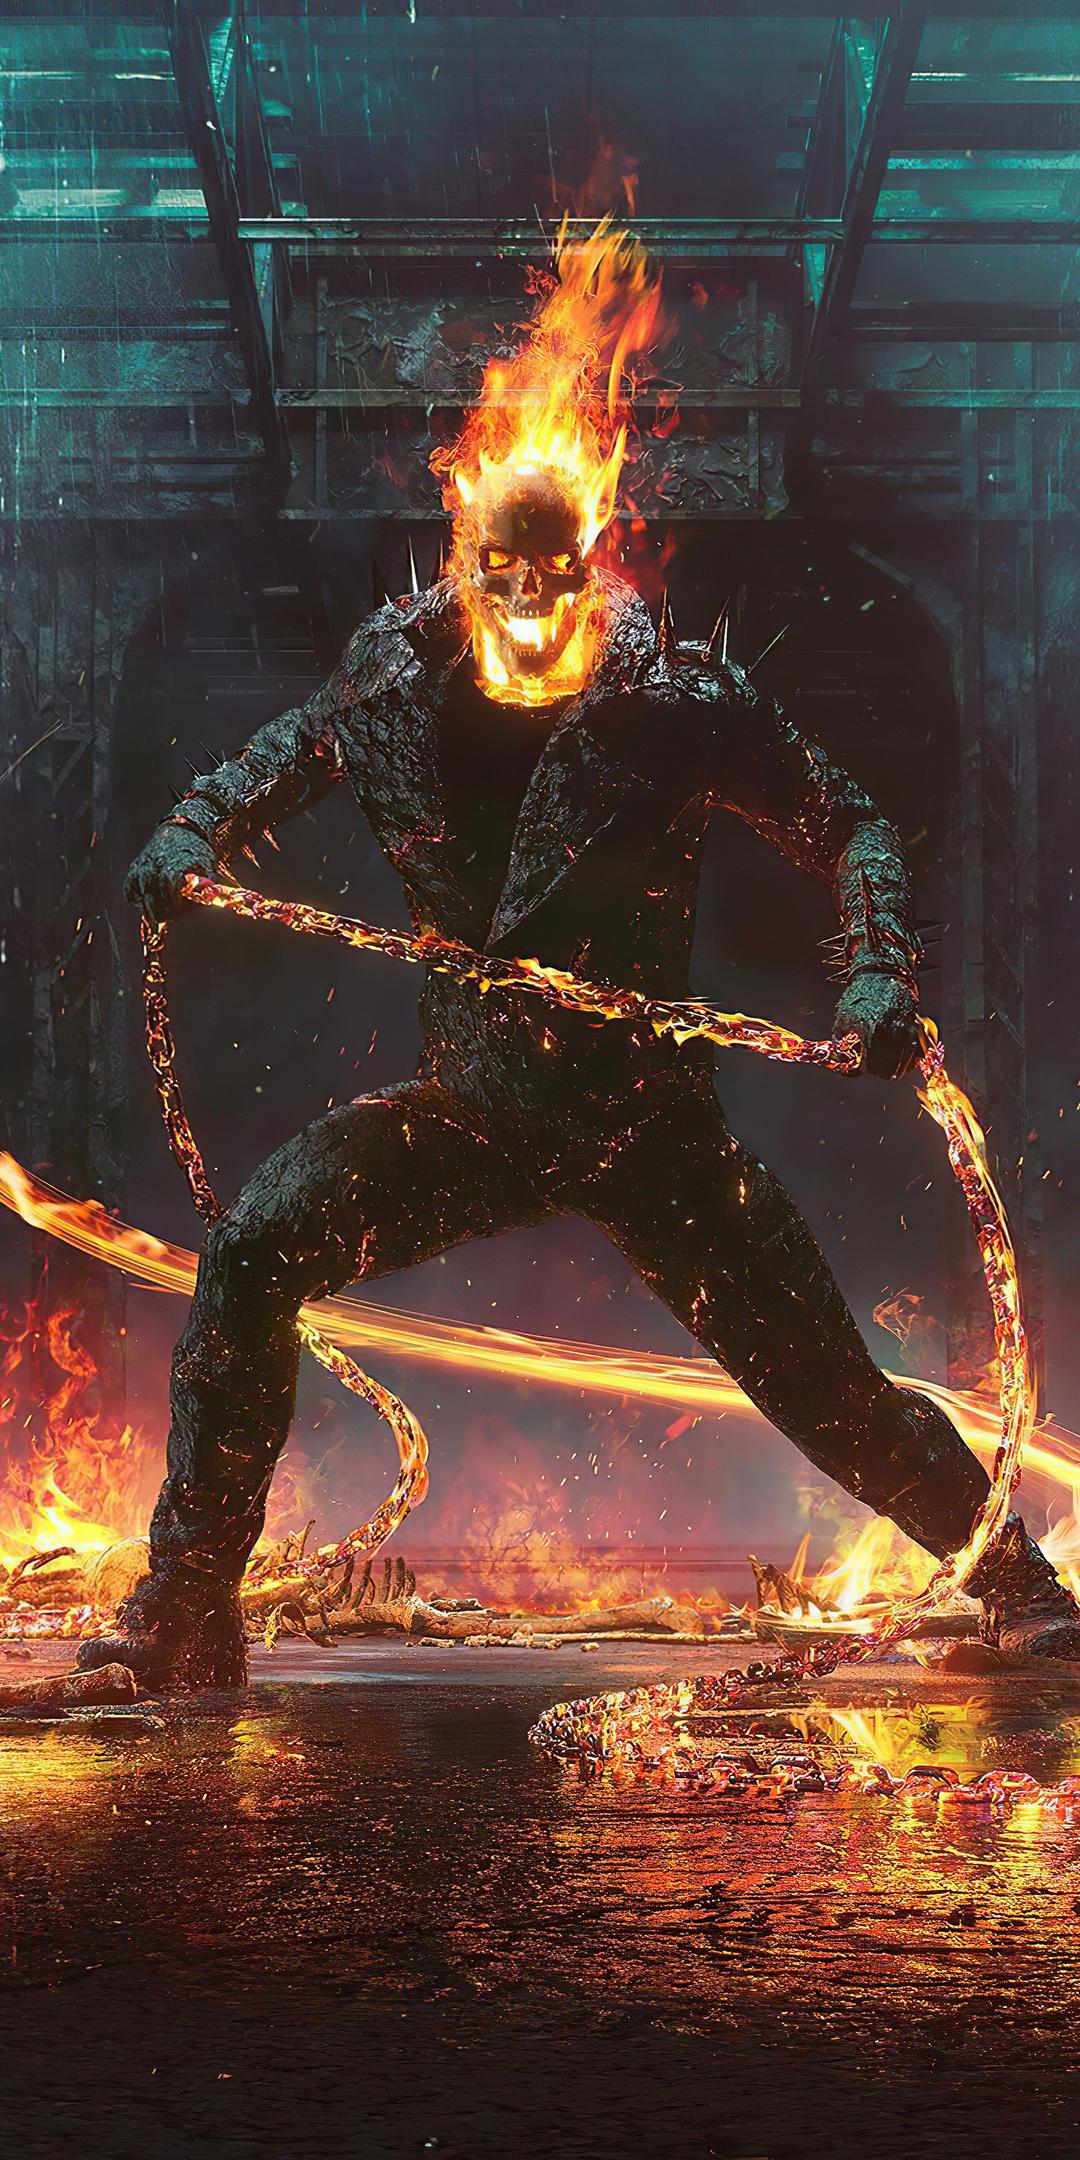 ghost-rider-flame-mask-4k-e8.jpg